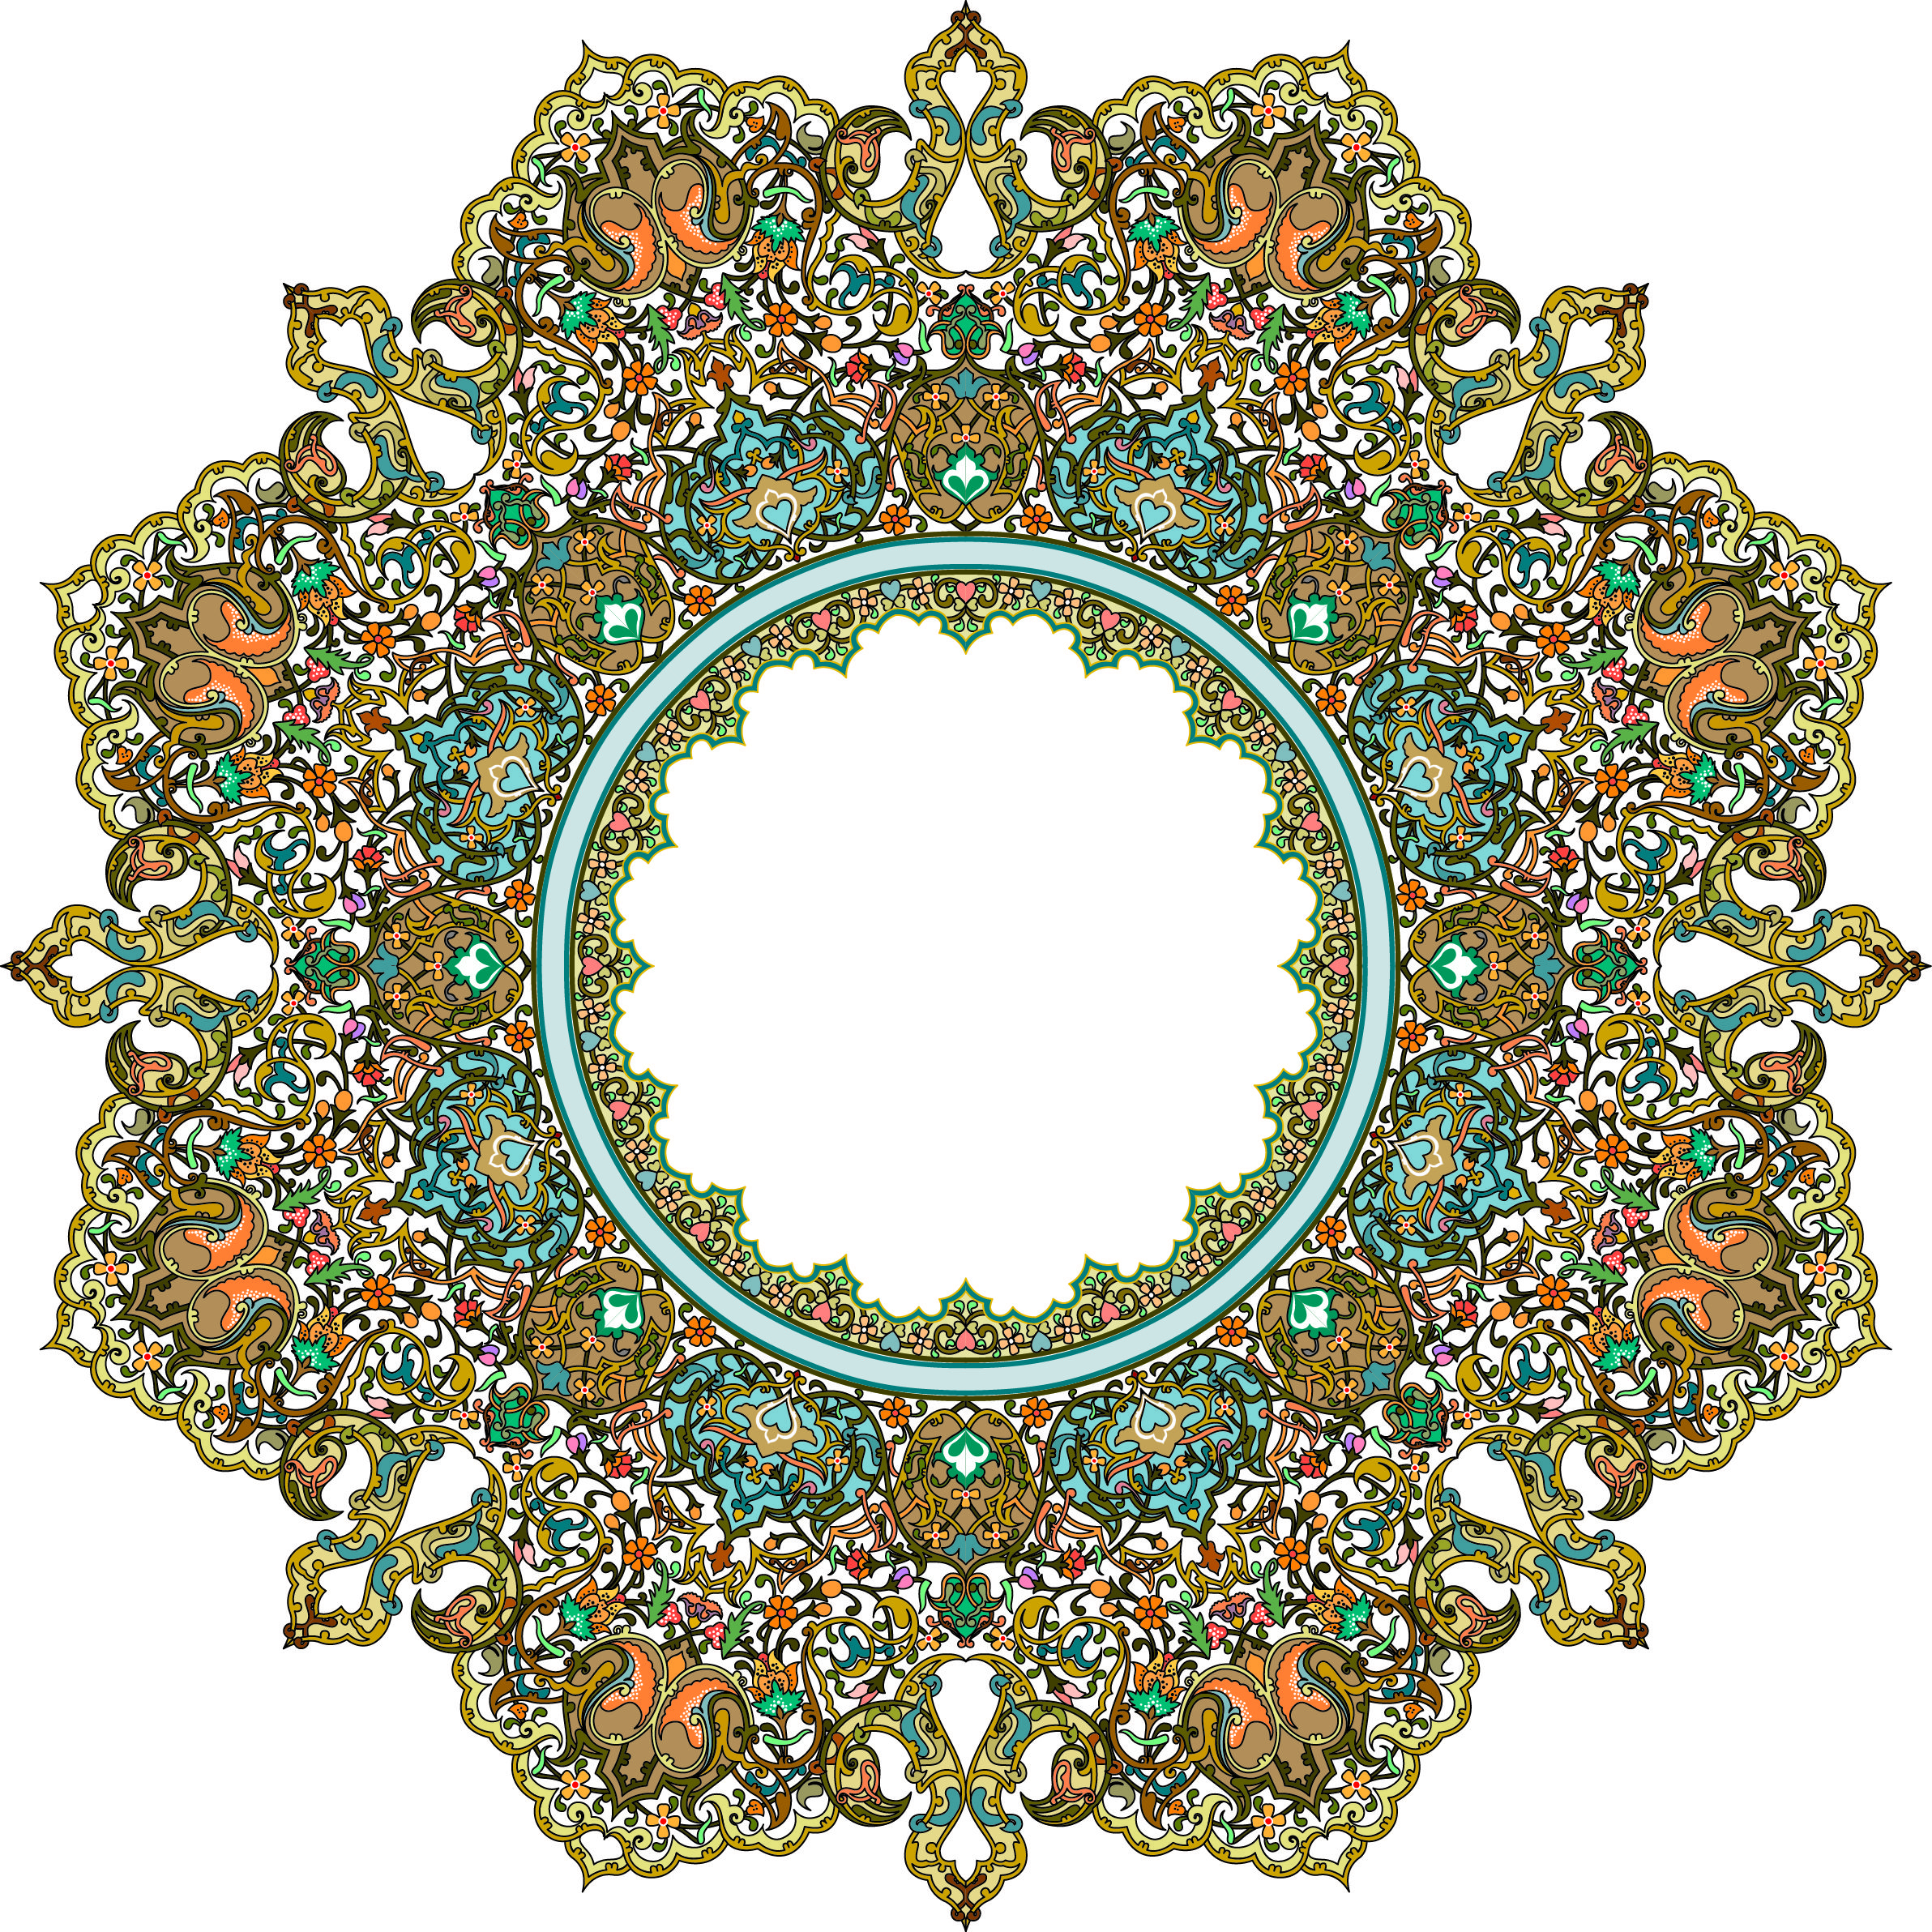 Shiagraph Category Floral Pattern Khatai Image 43 Floral Pattern Khatai Islamic Art Pattern Islamic Art Persian Calligraphy Art